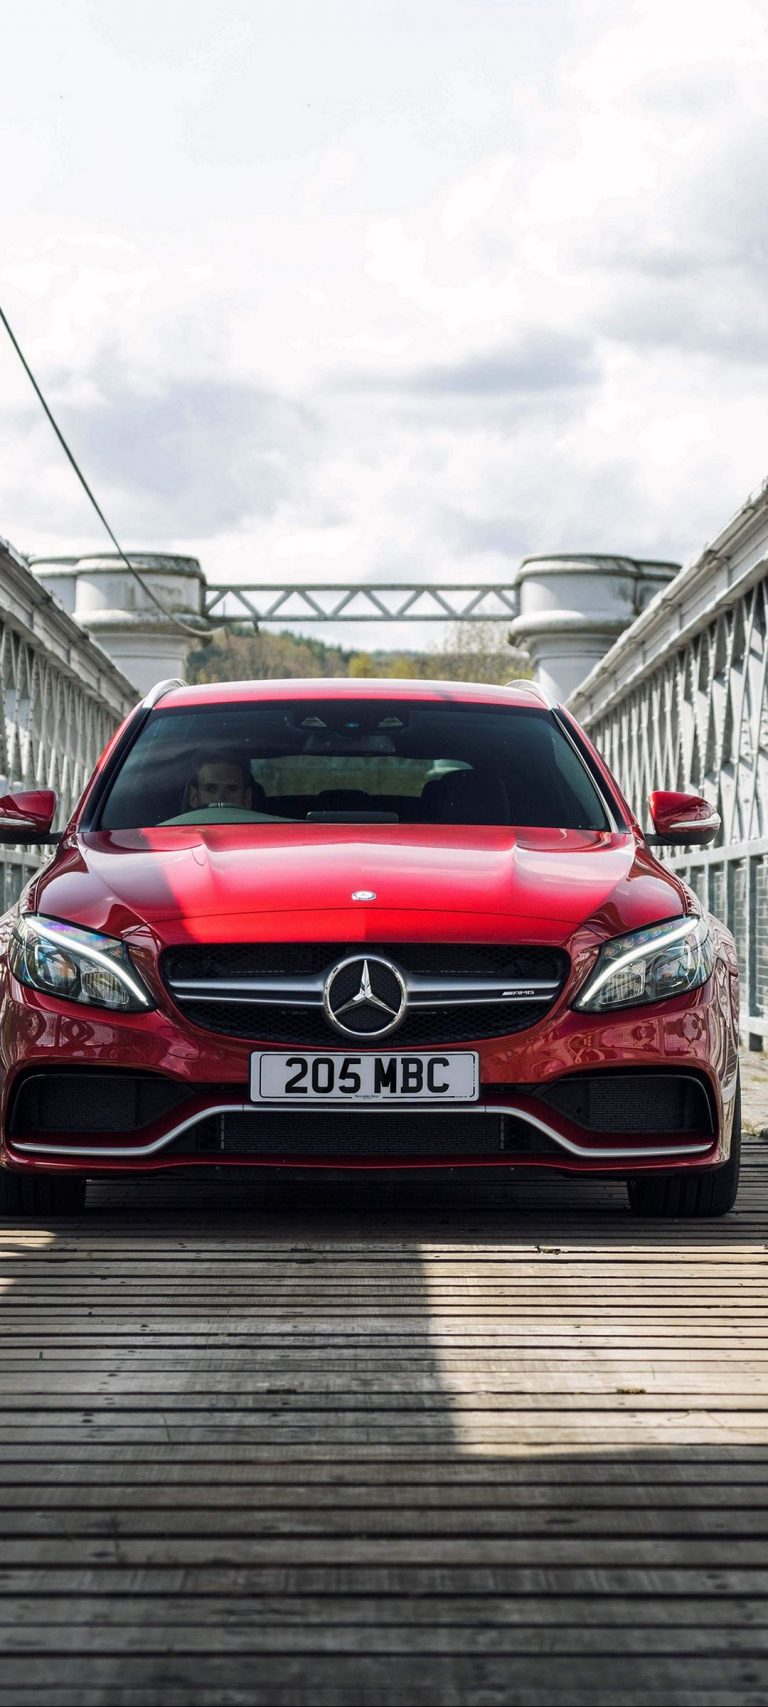 Mercedes Amg C63 Estate 1080x2400 768x1707